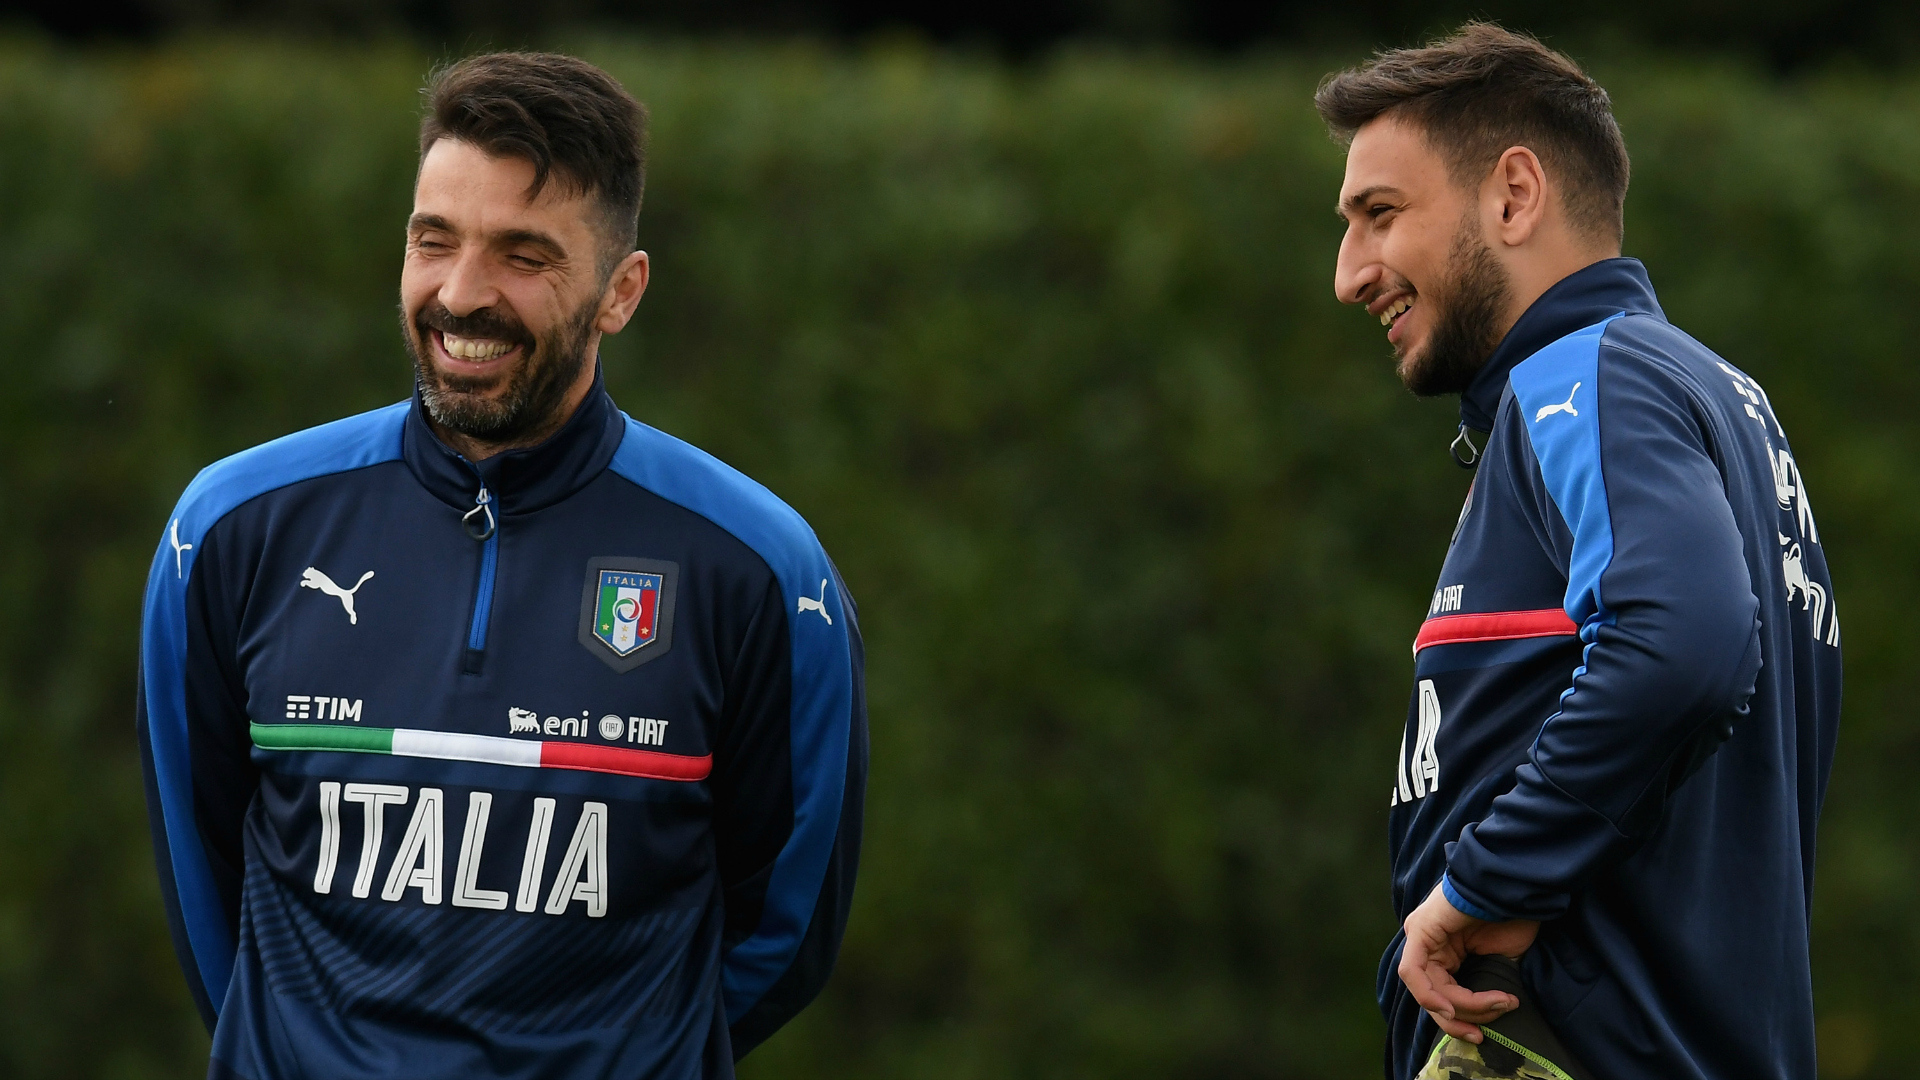 Italie Buffon a encore des